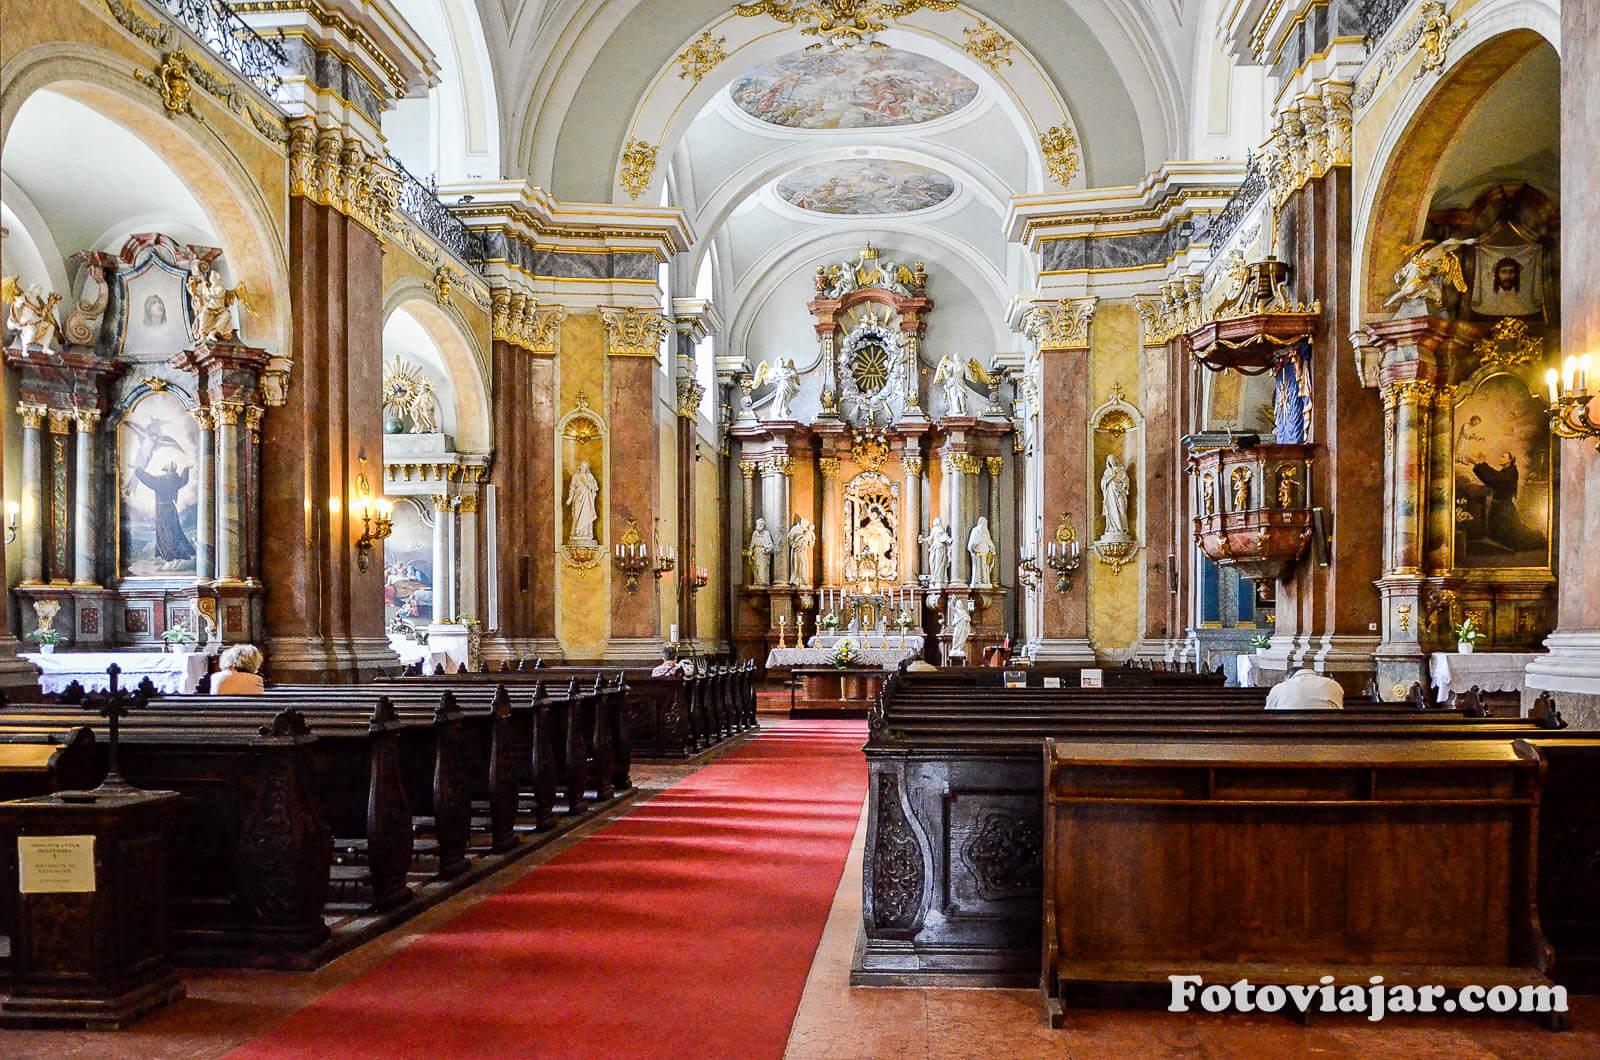 budapeste visitar igrejas